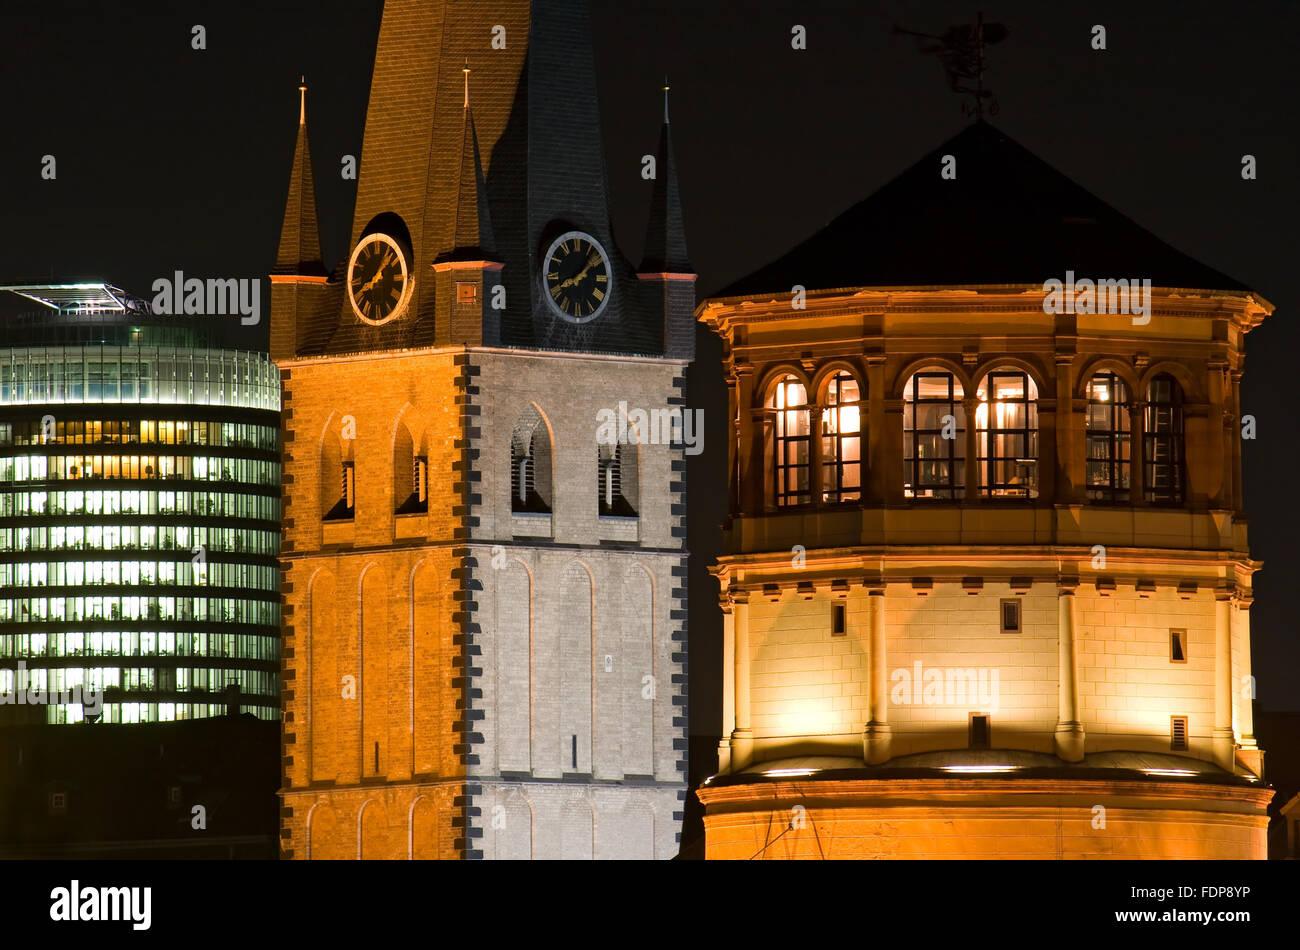 düsseldorf - Stock Image